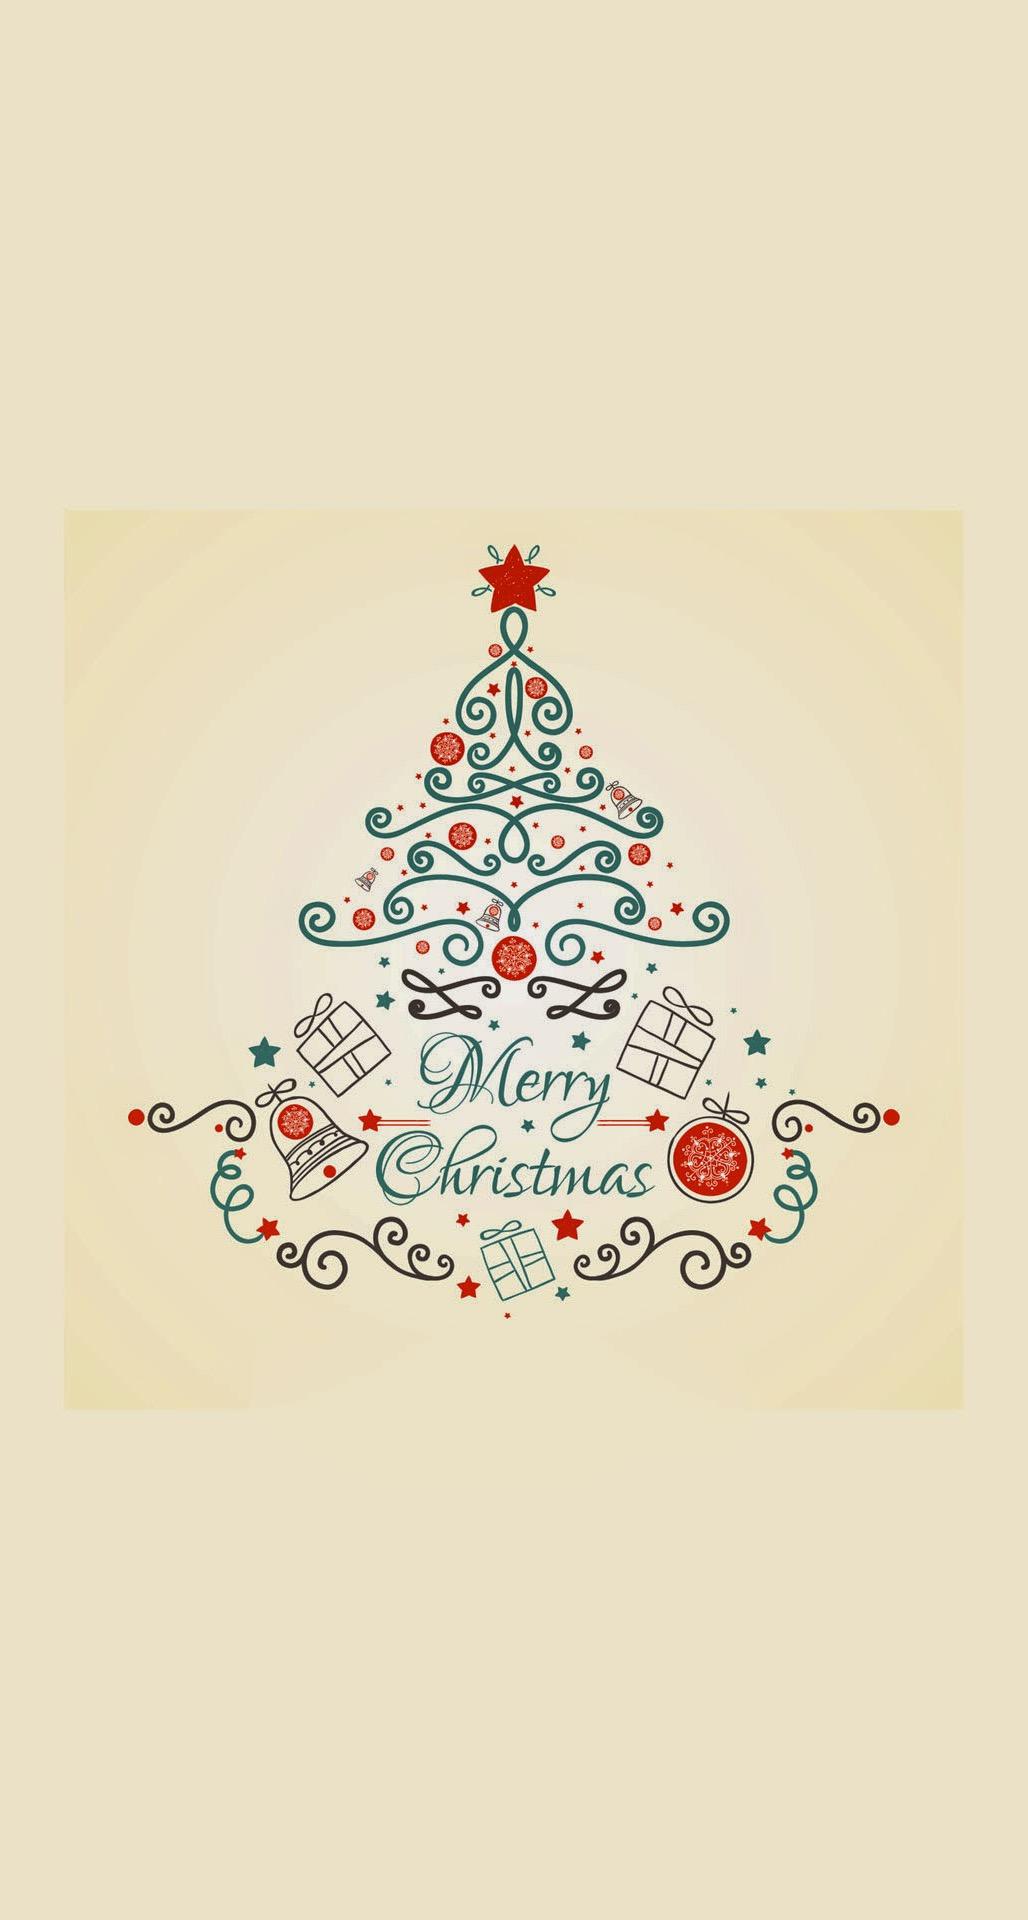 Christmas Tree 2015 Wishes IPhone 6 Plus HD Wallpaper IPod 1028x1920